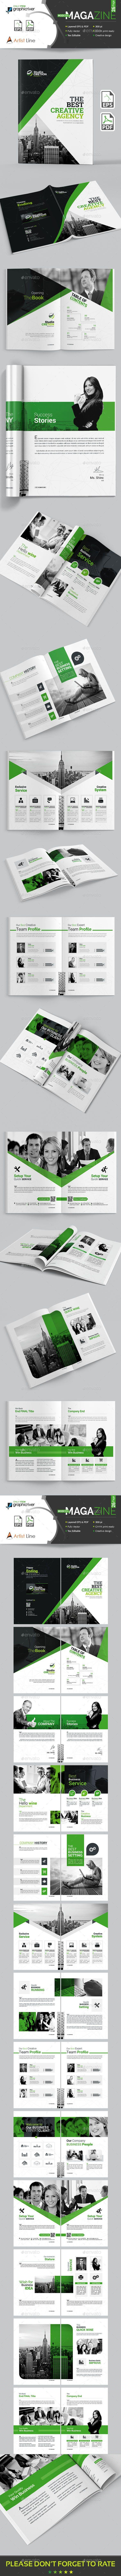 Magazine | Magazine Templates | Pinterest | Print templates ...